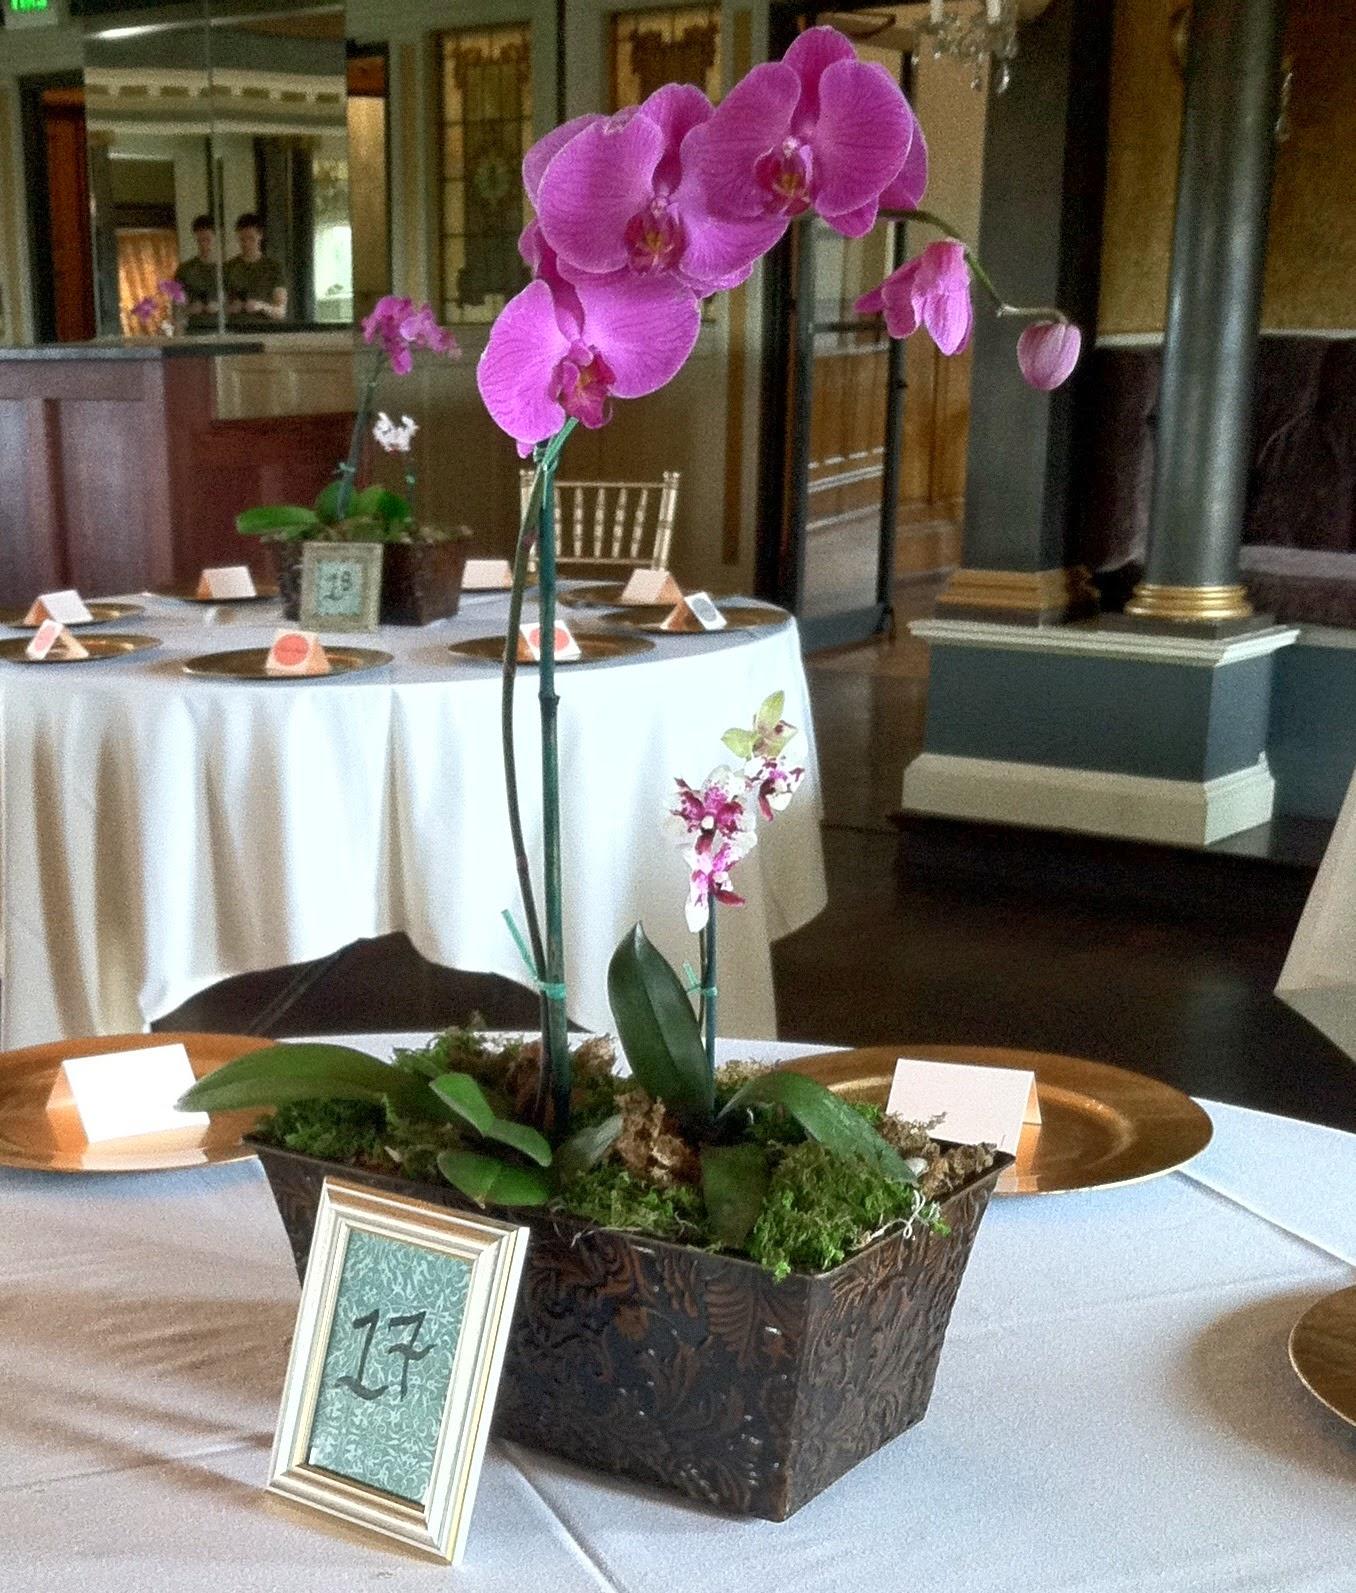 Orchid Flower Arrangements For Weddings: Chuck Does Art: Wedding Centerpieces: Orchids